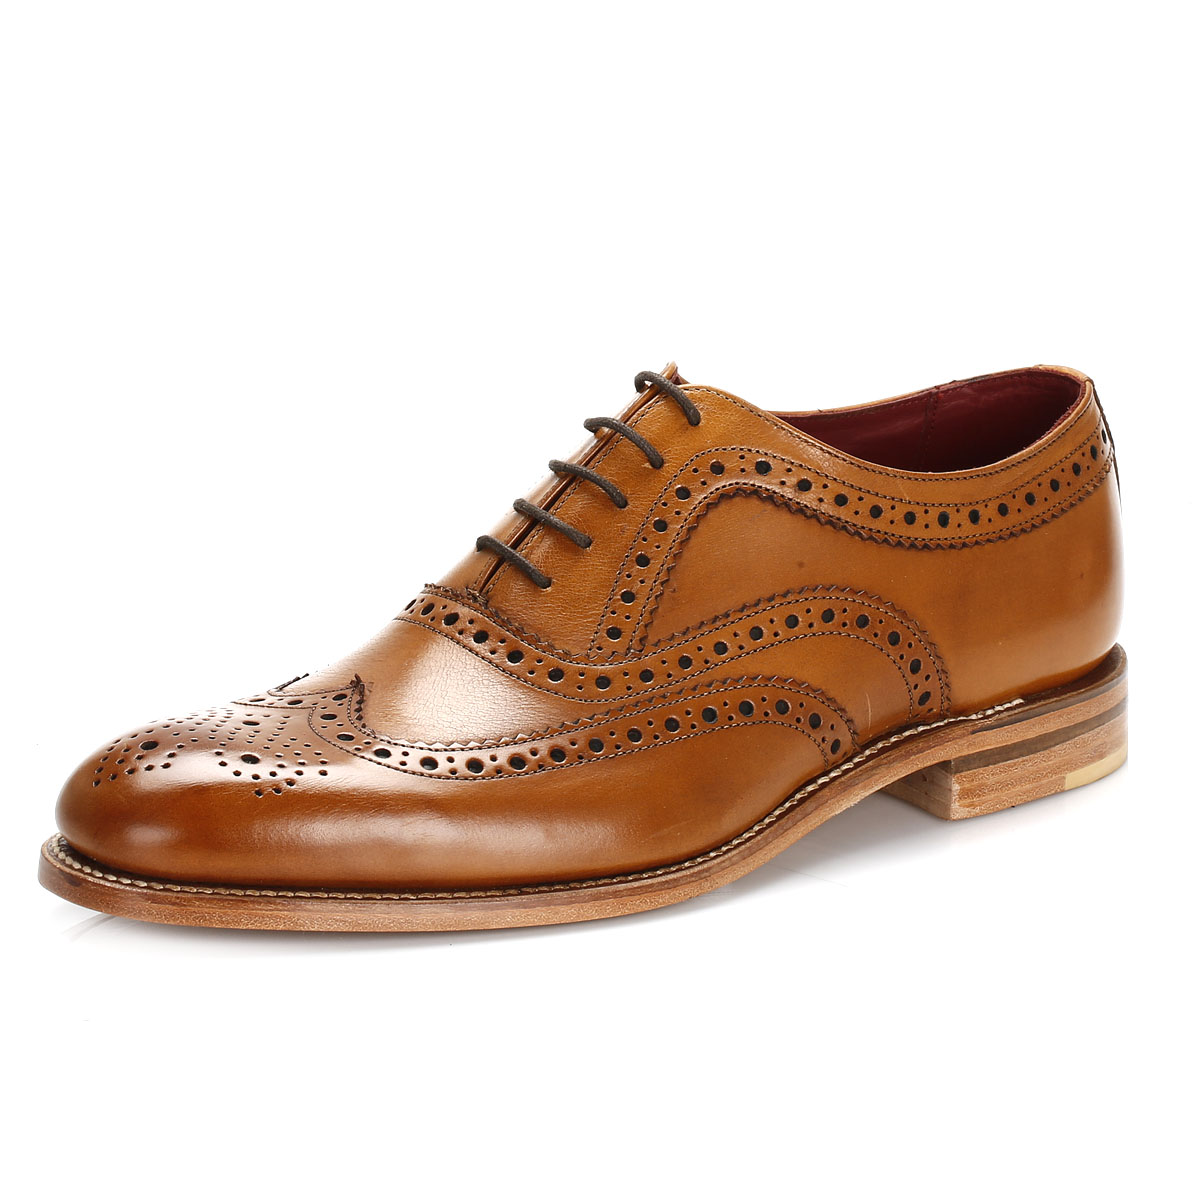 Ebay Mens Dress Shoes Size